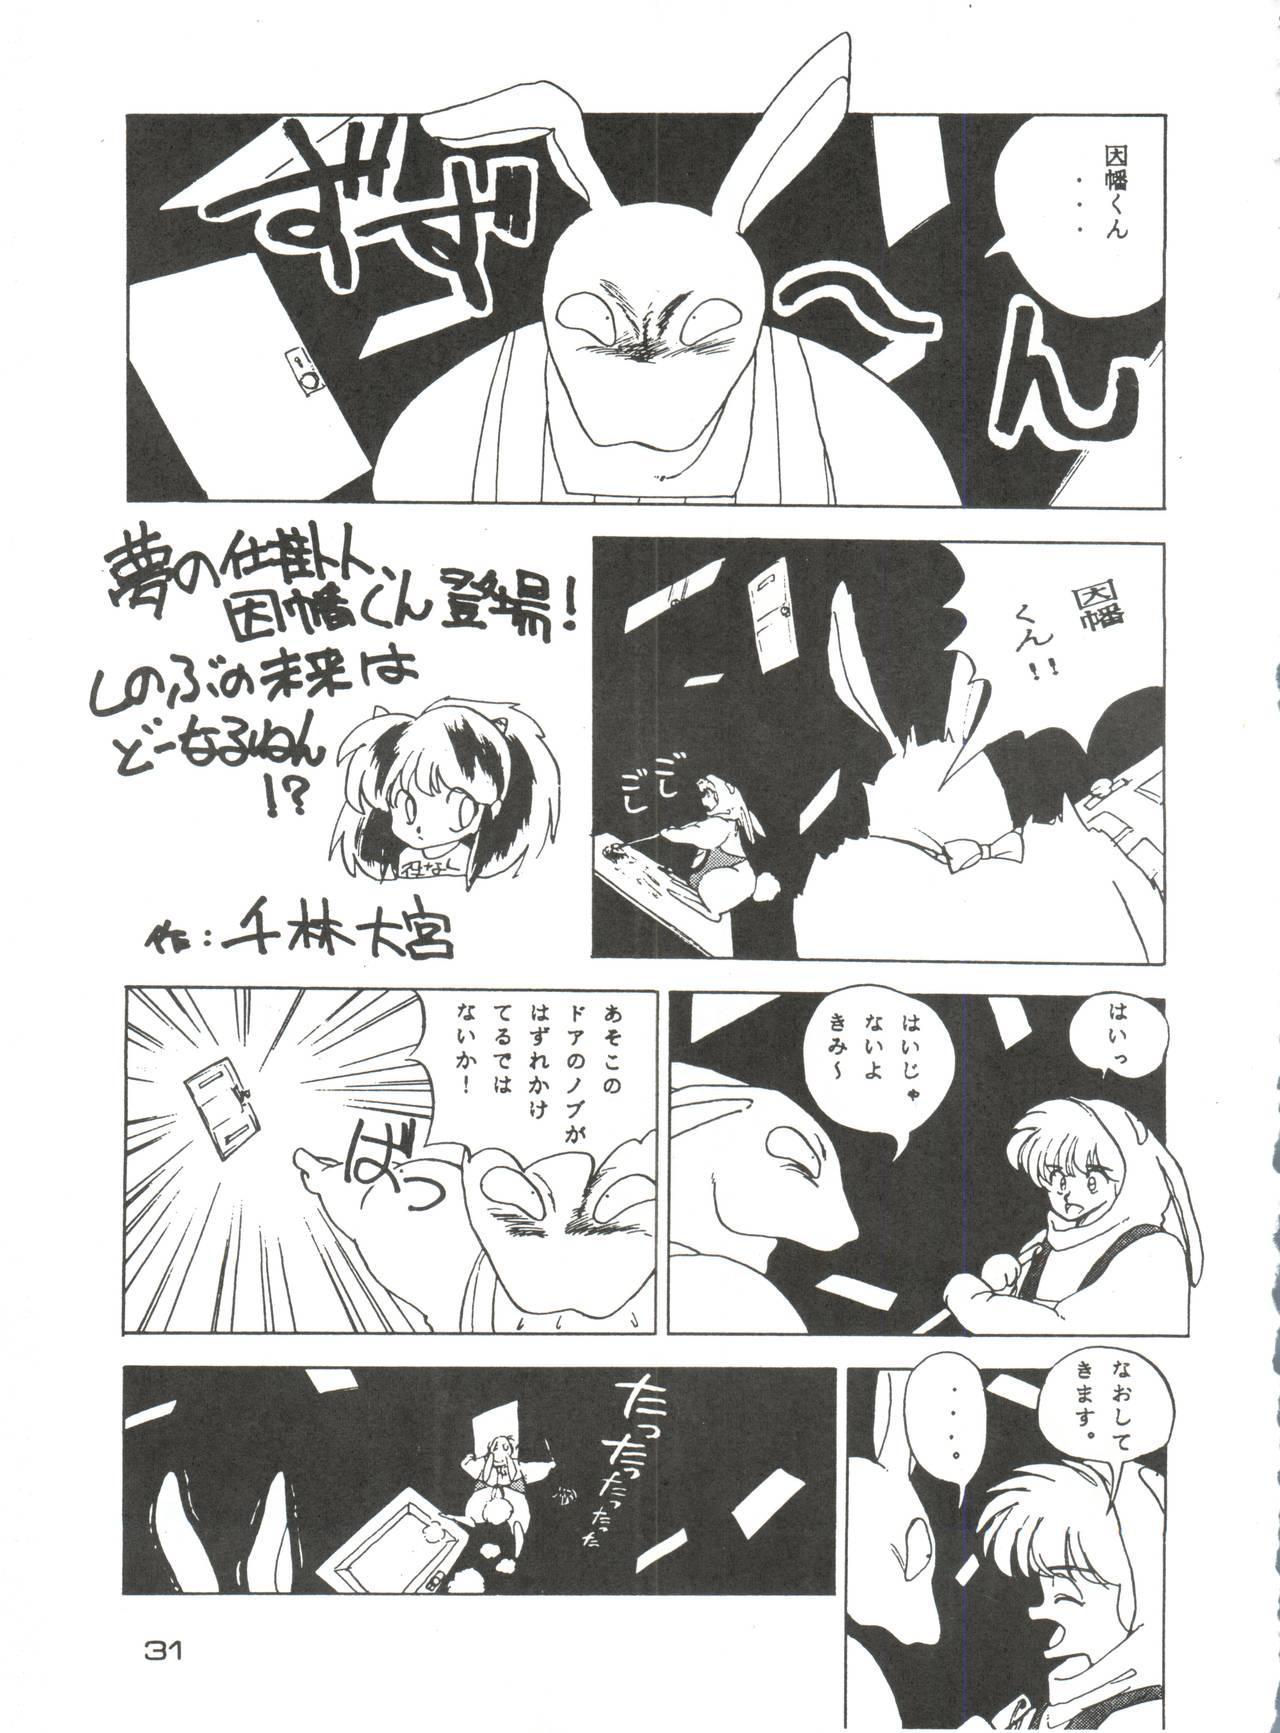 [Studio Fuck (Various) Onapet 7 (Sonic Soldier Borgman, Gundam ZZ, Osomatsu-kun) 30